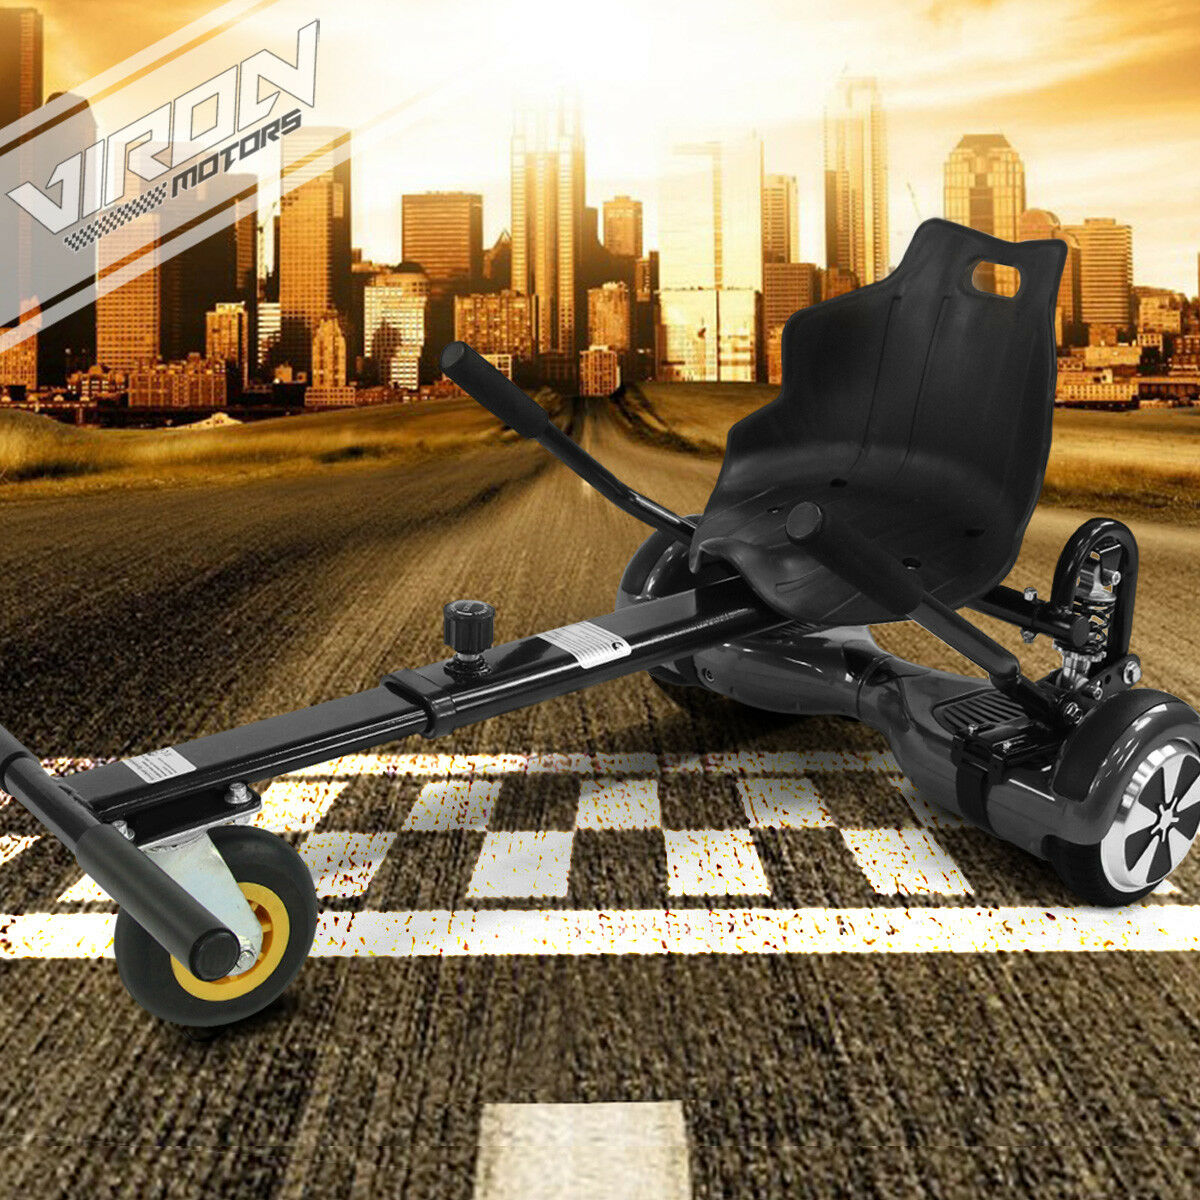 Hoverkart para self Equilibrar scooter e-scooter Tablero sede hover SEAT con suspensión